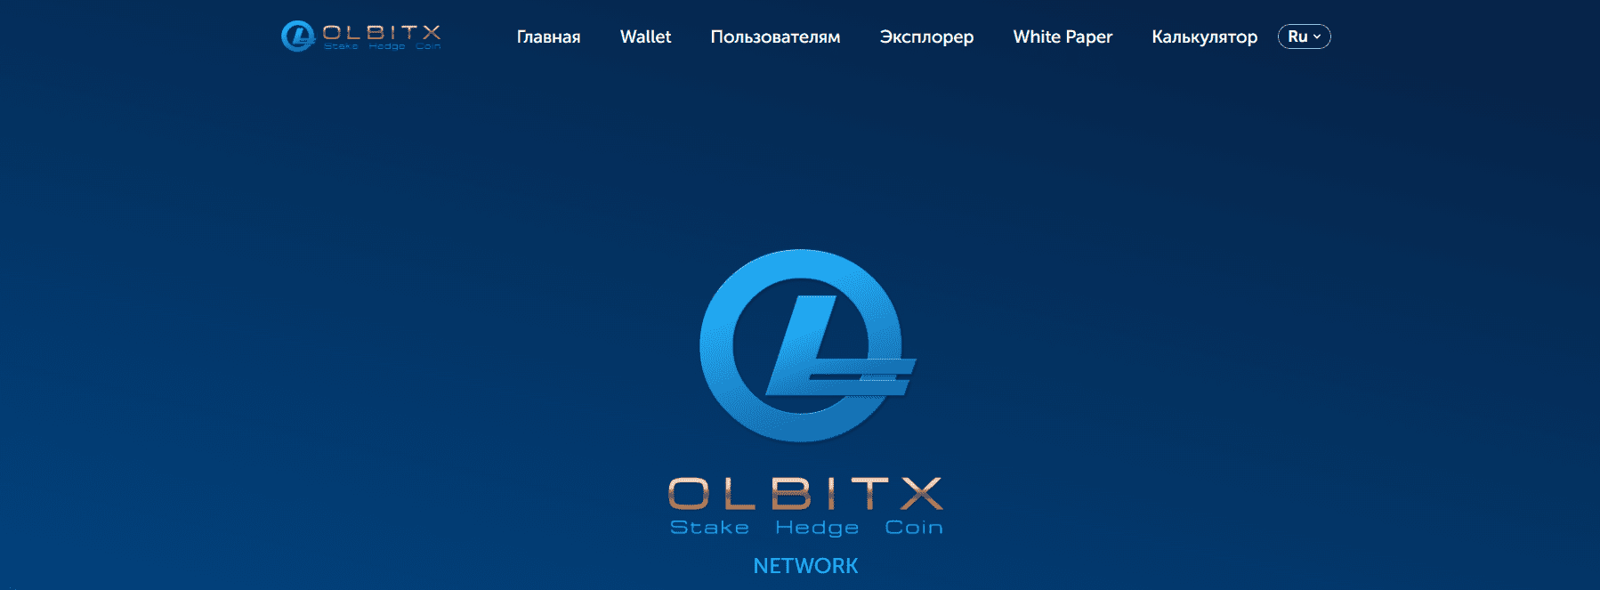 сайт блокчейна Olbitx